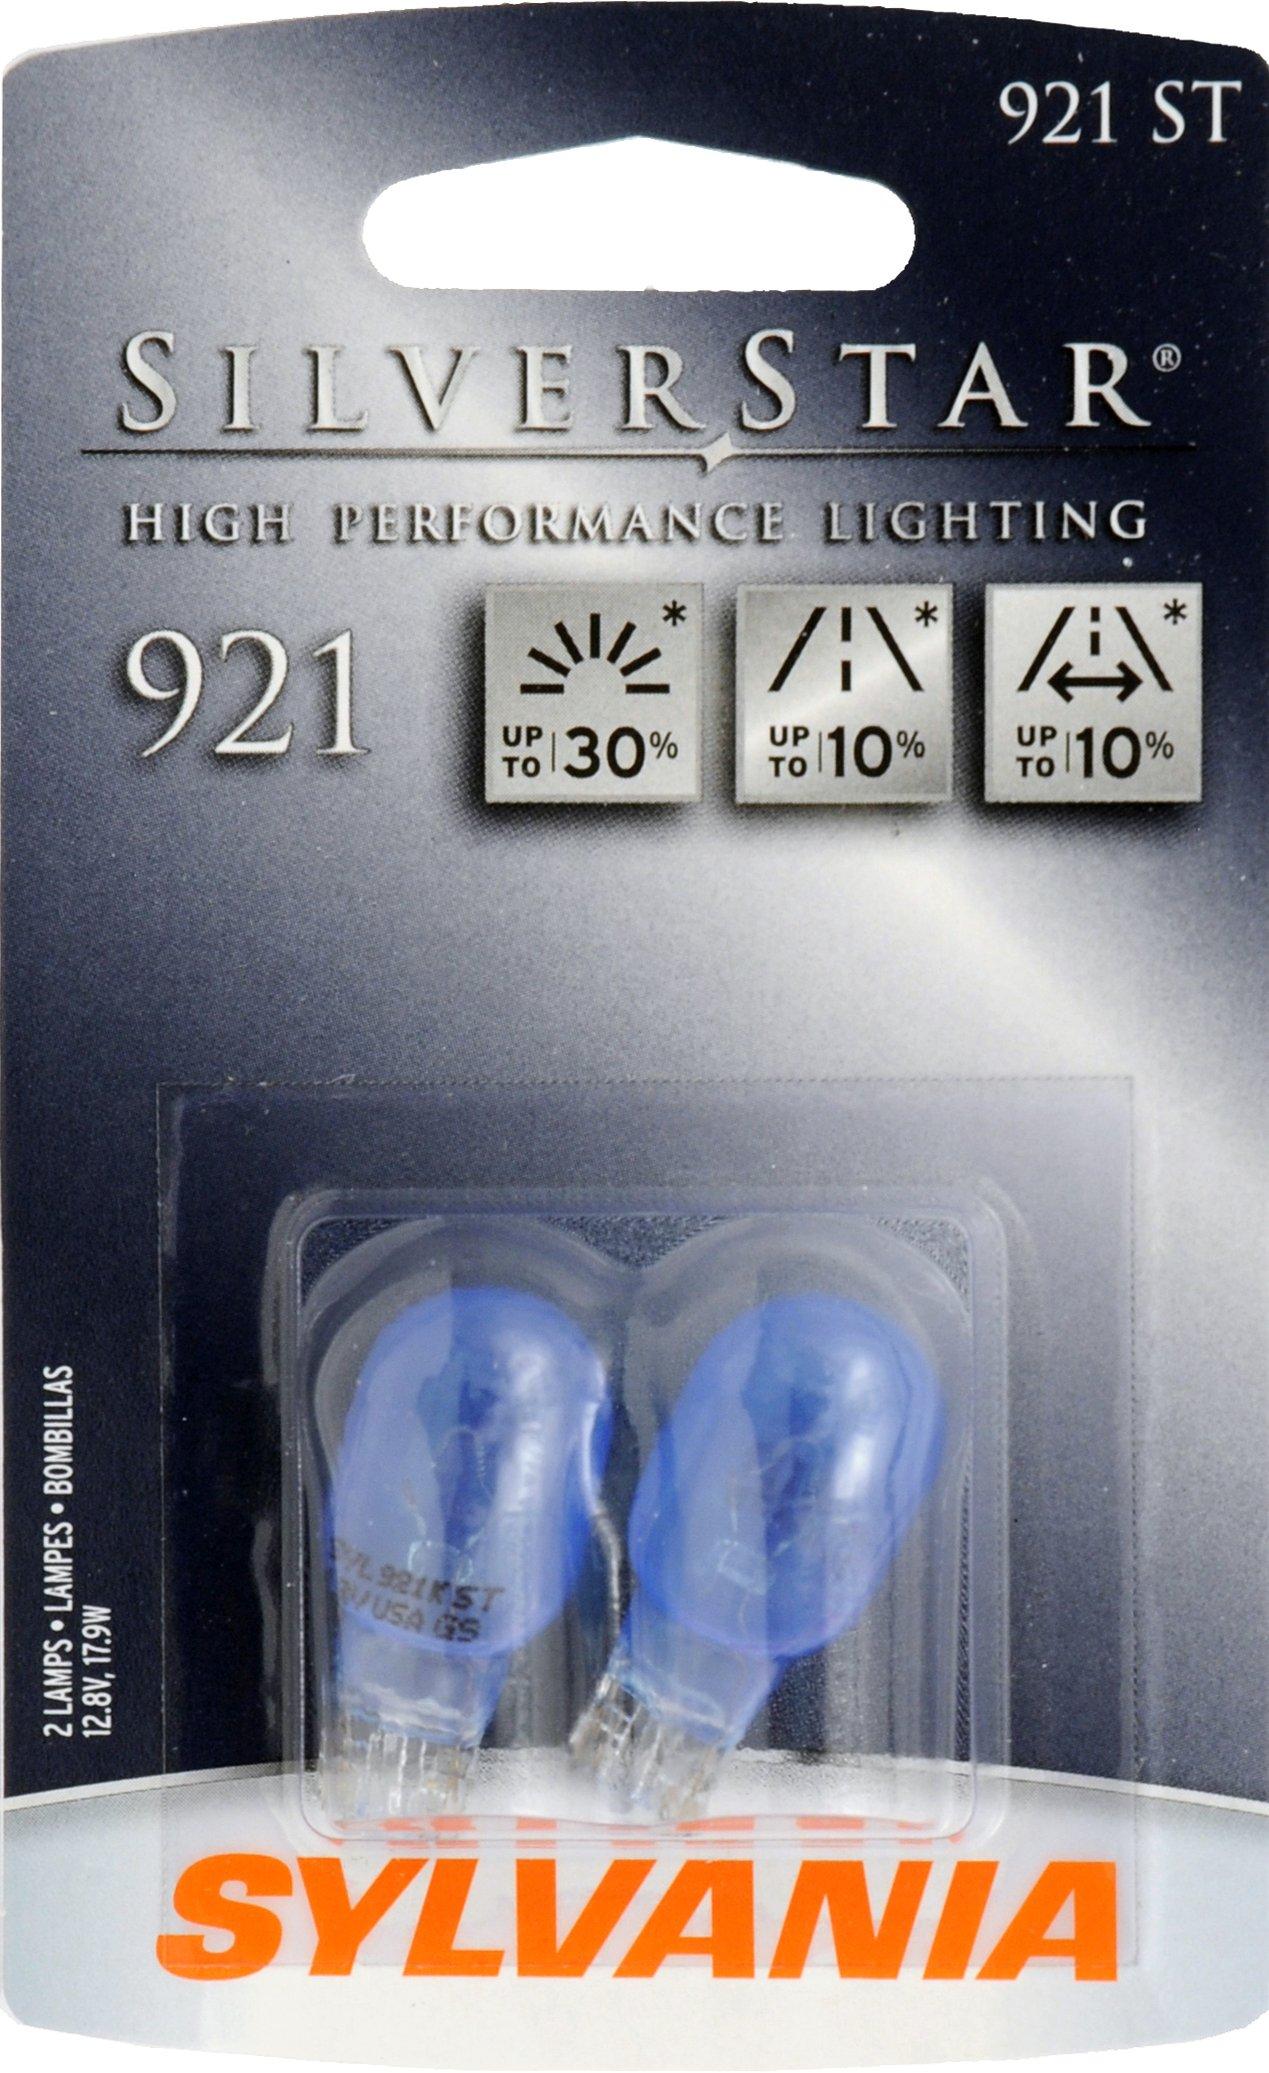 Osram Sylvania 921 ST SilverStar High Performance Halogen Miniature Lamp, (Pack of 2)